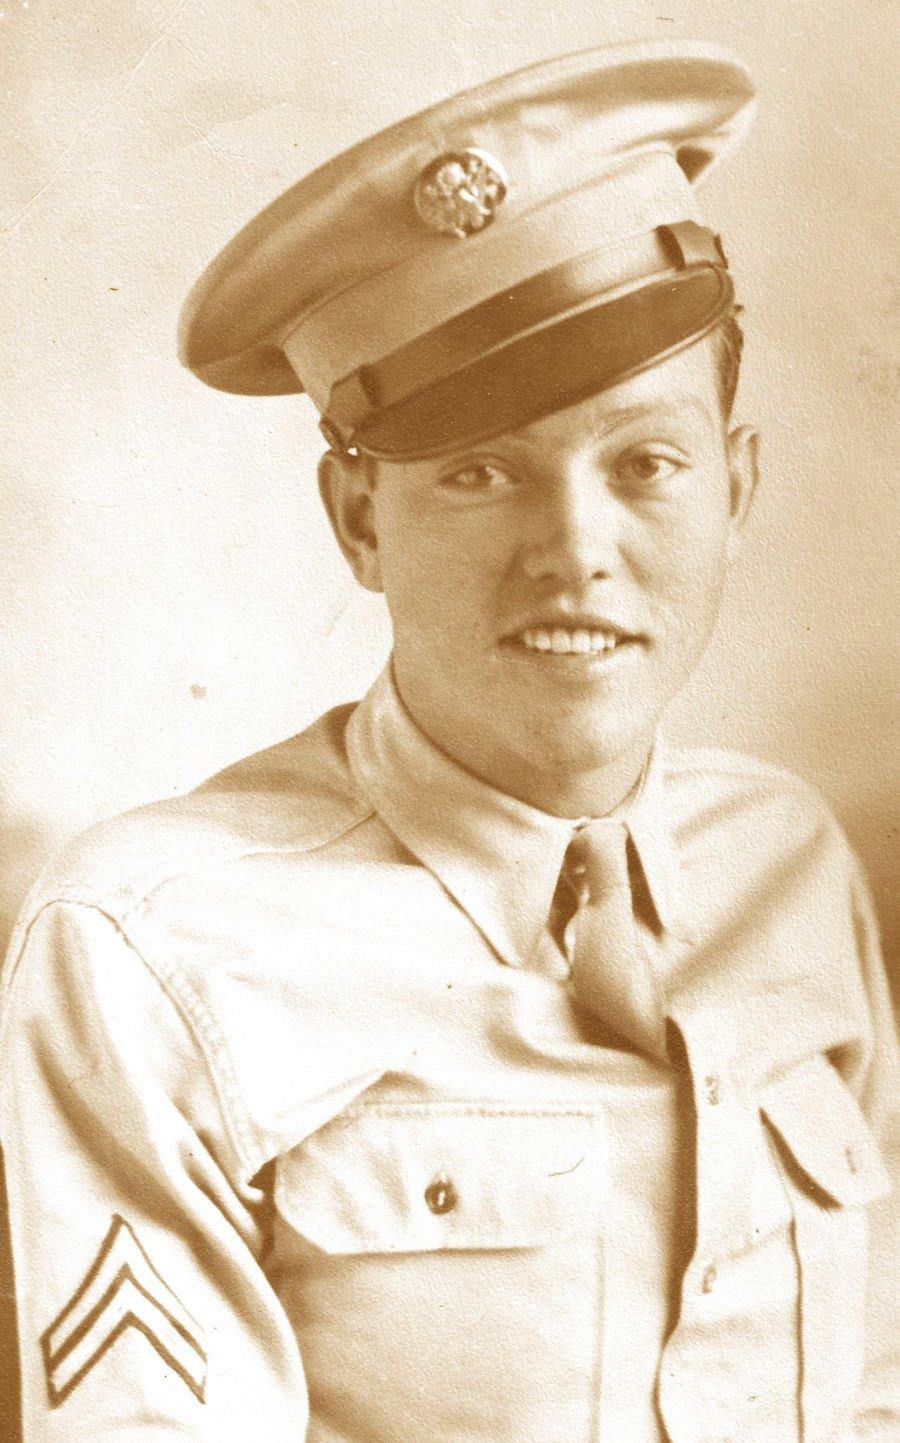 Bill Roberts in World War II